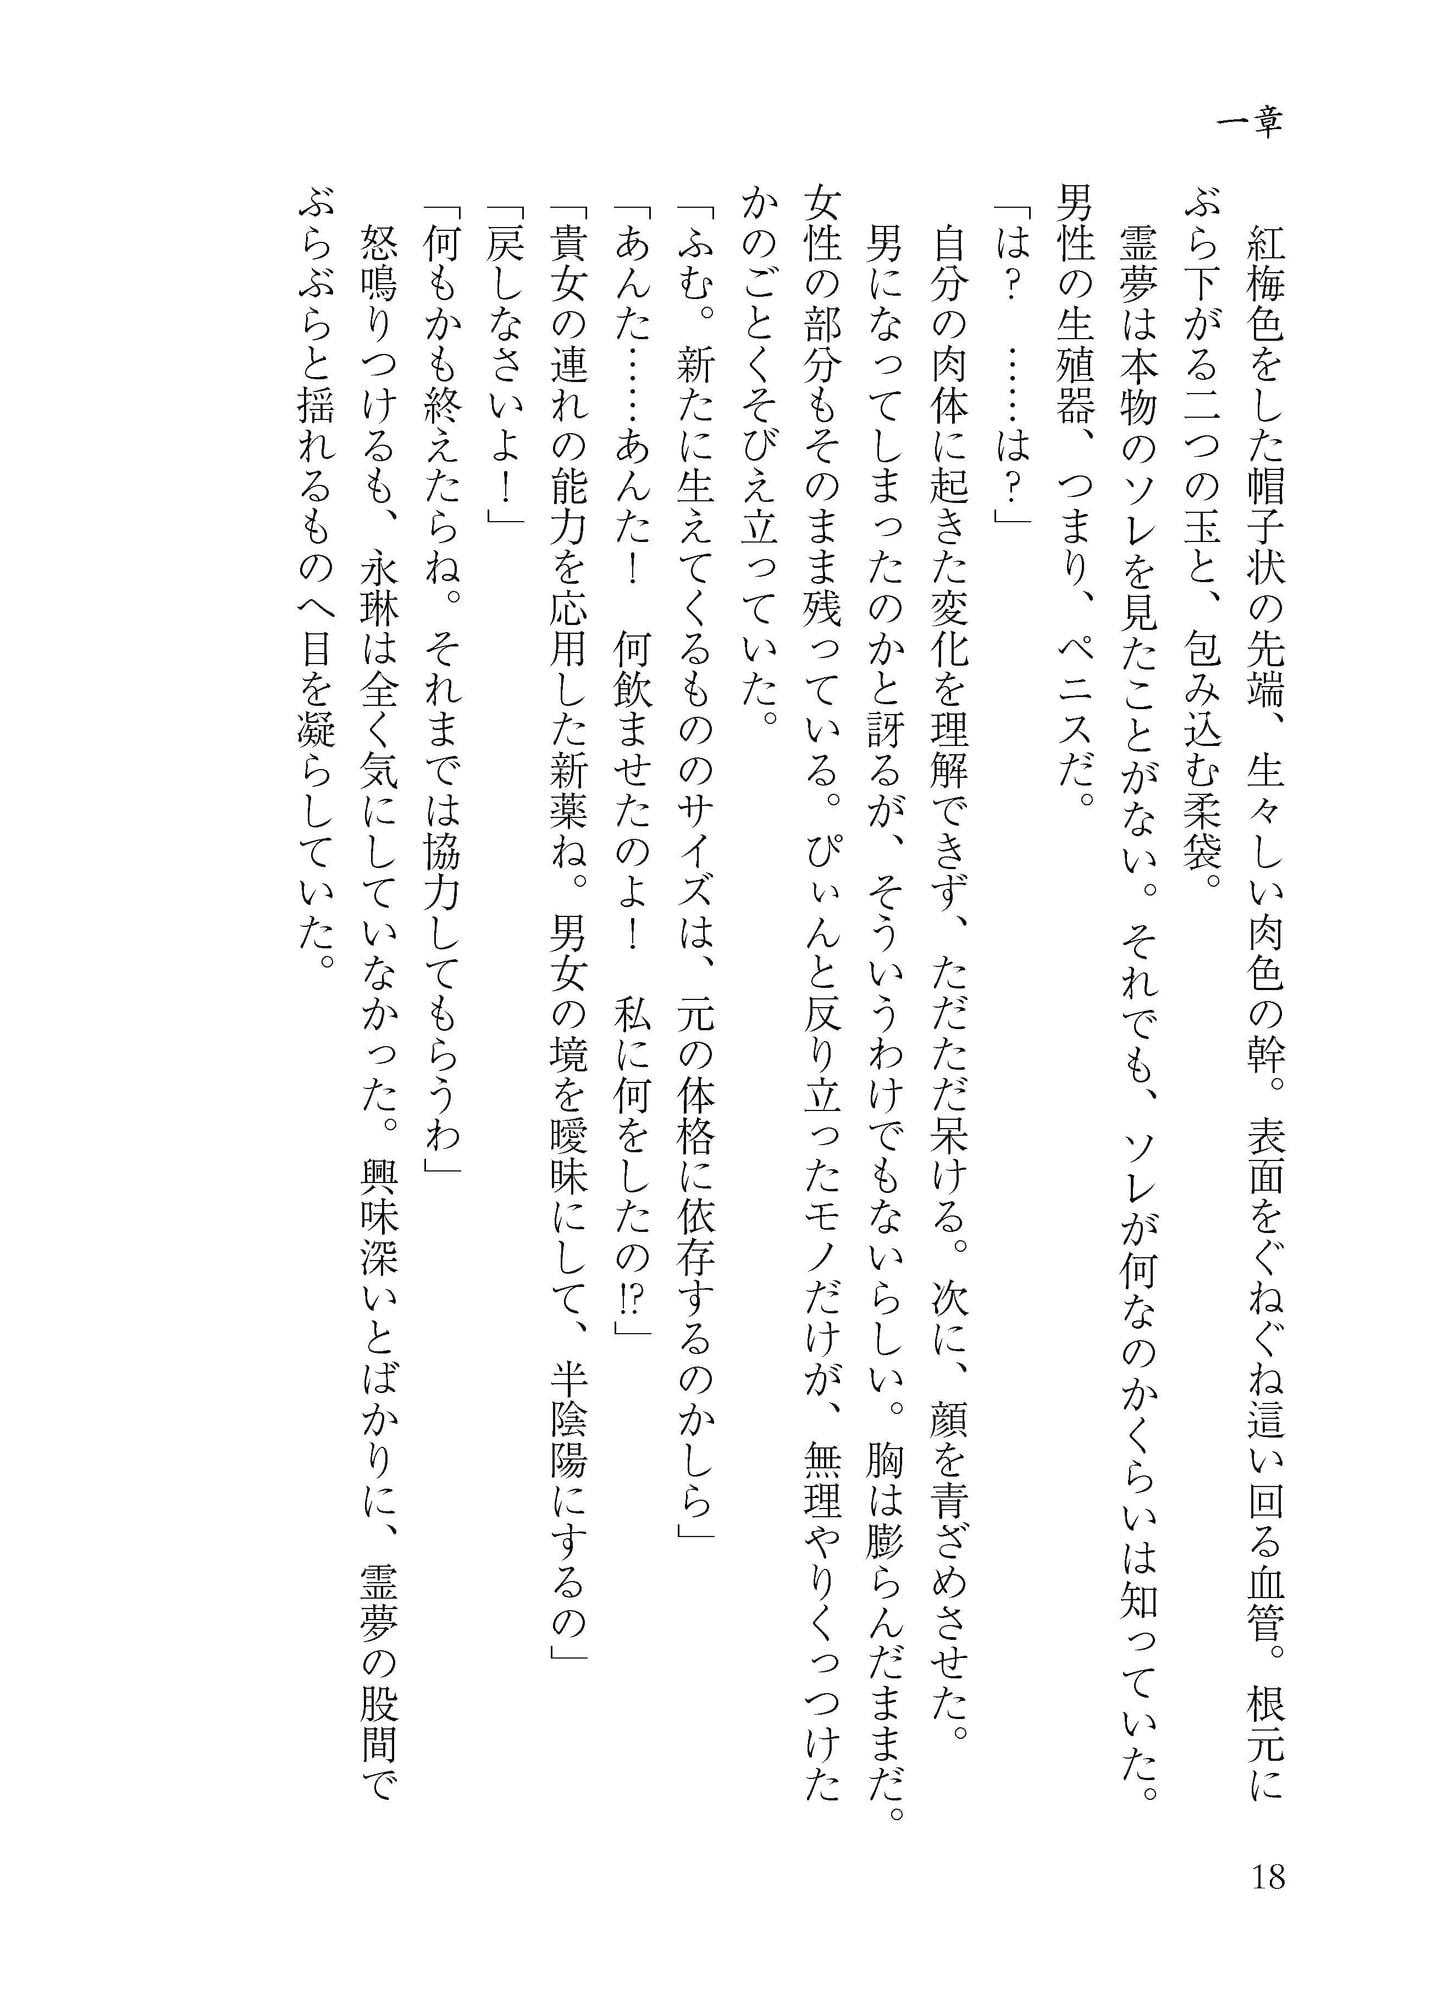 RJ325529 生やさ霊夢のしこしこ調教 [20210429]